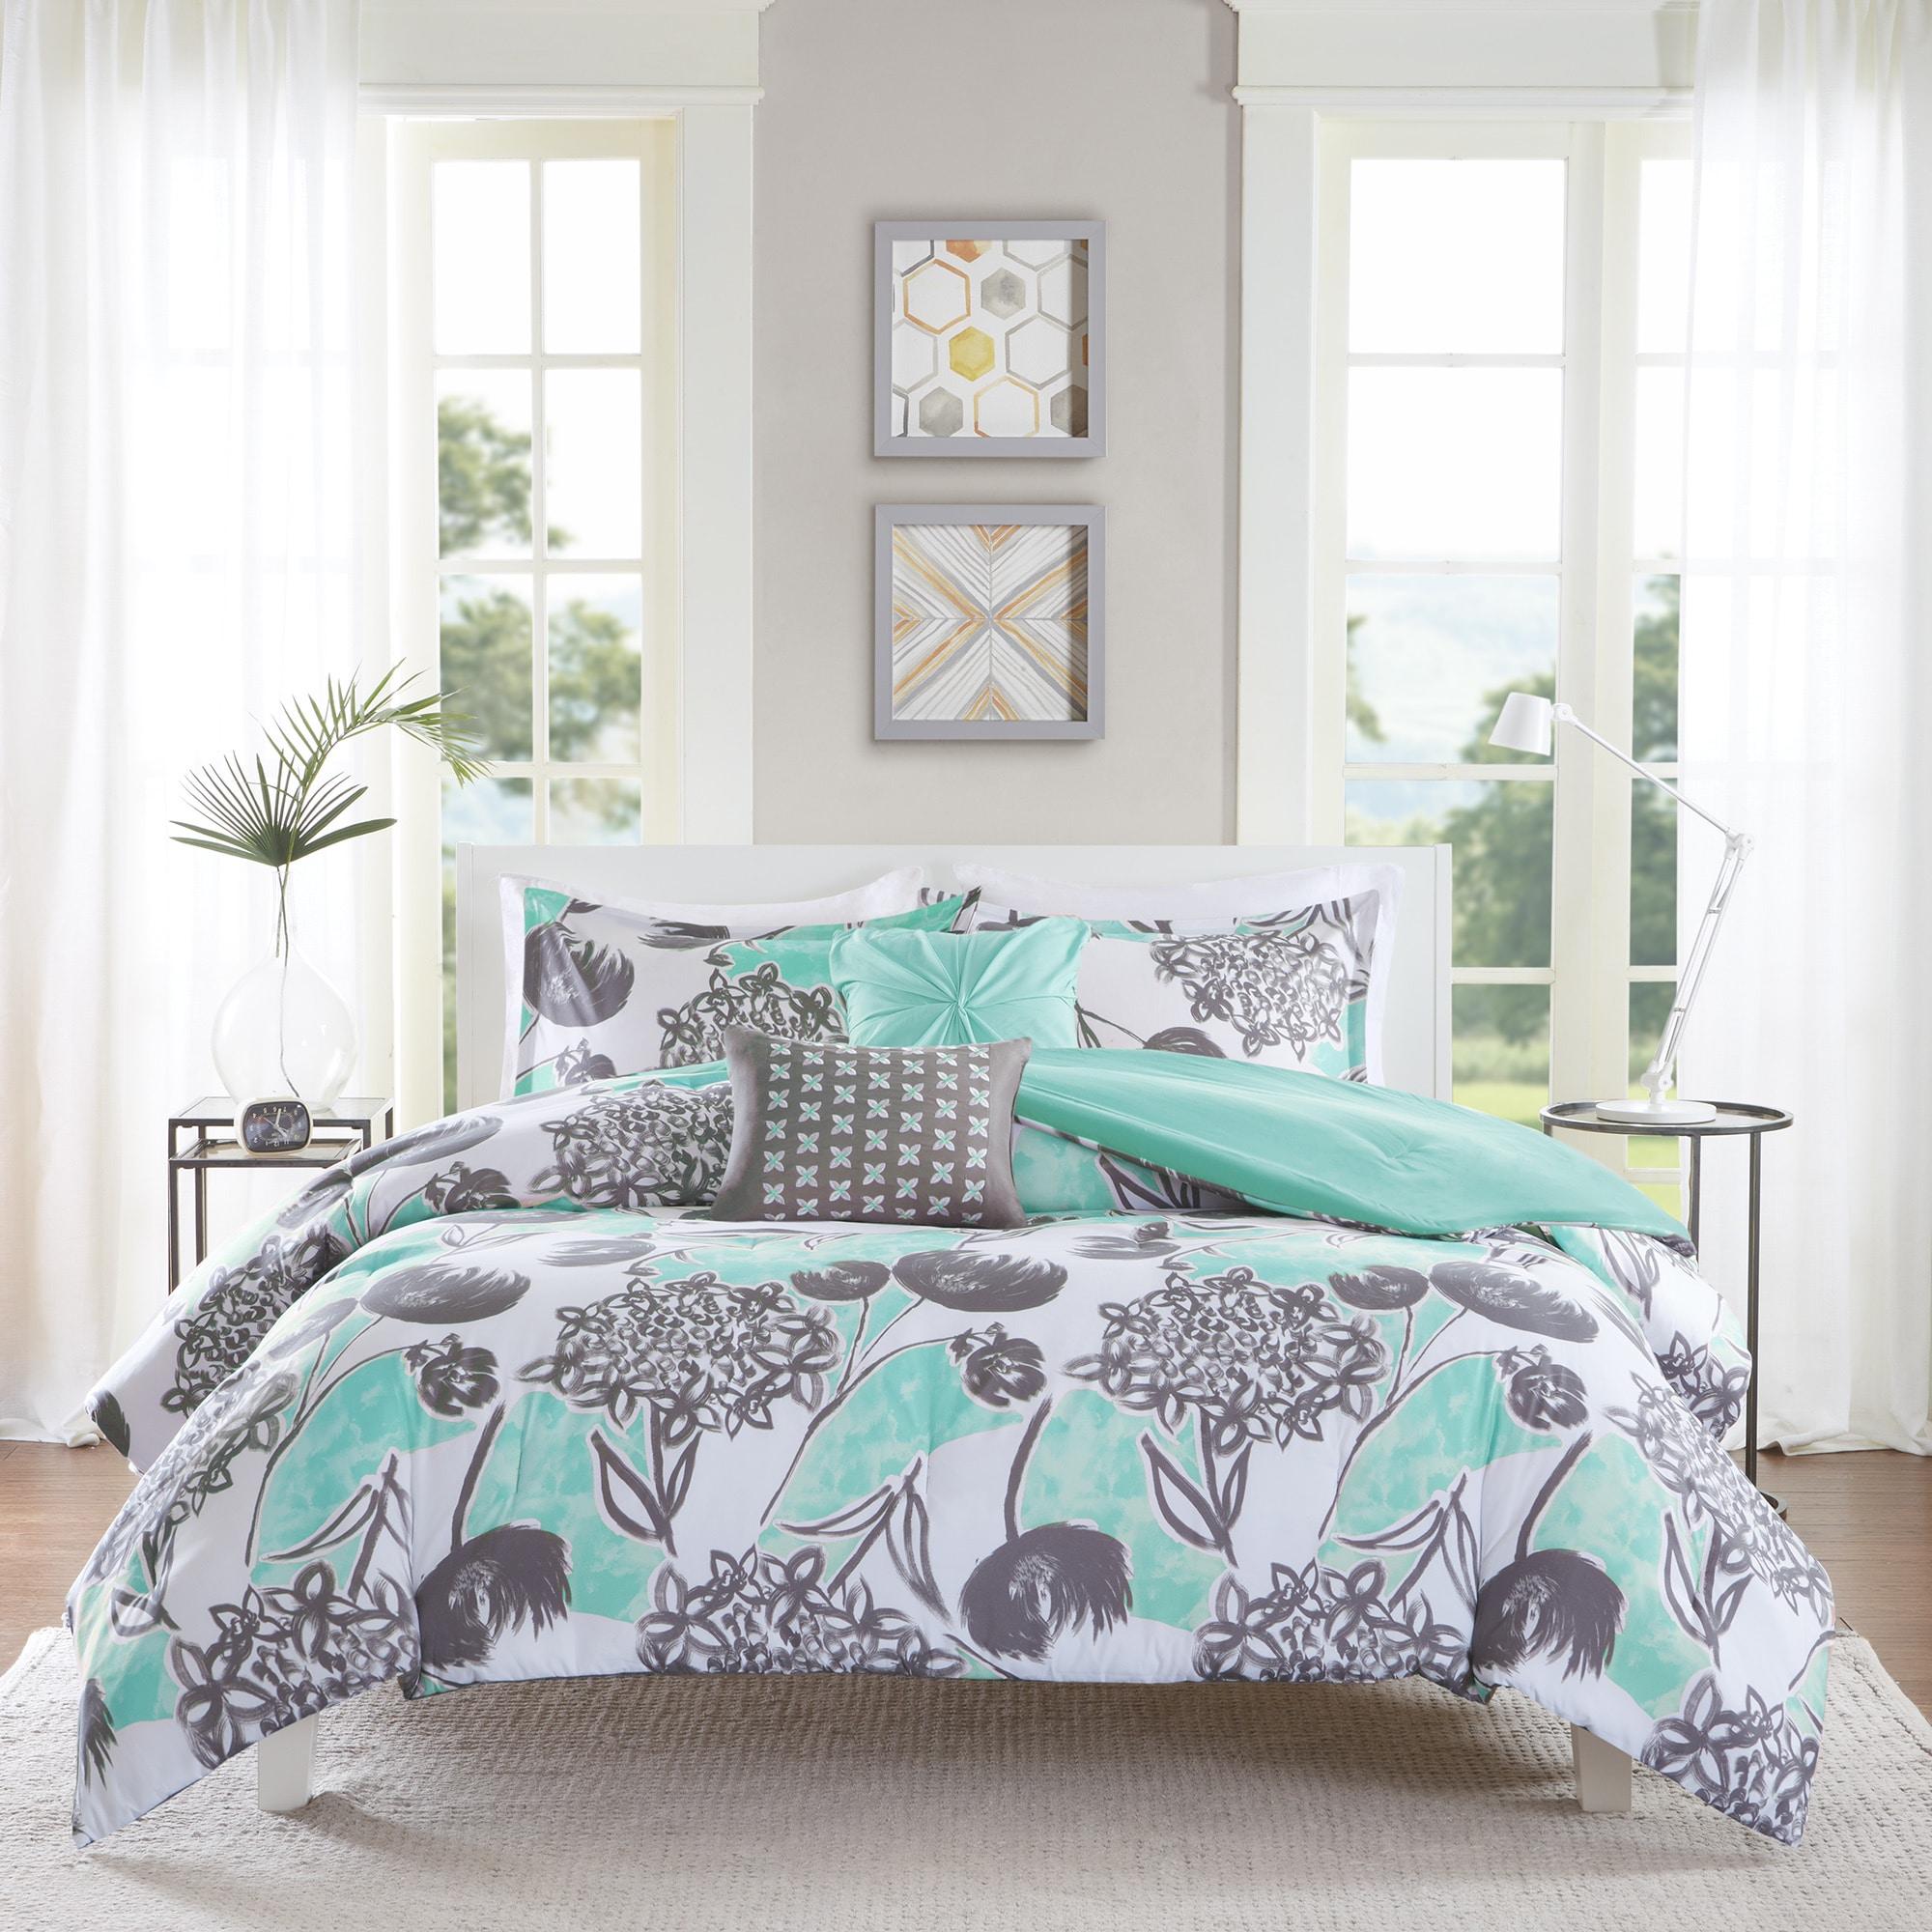 Intelligent Design Lily Aqua Comforter Set Overstock 11454274